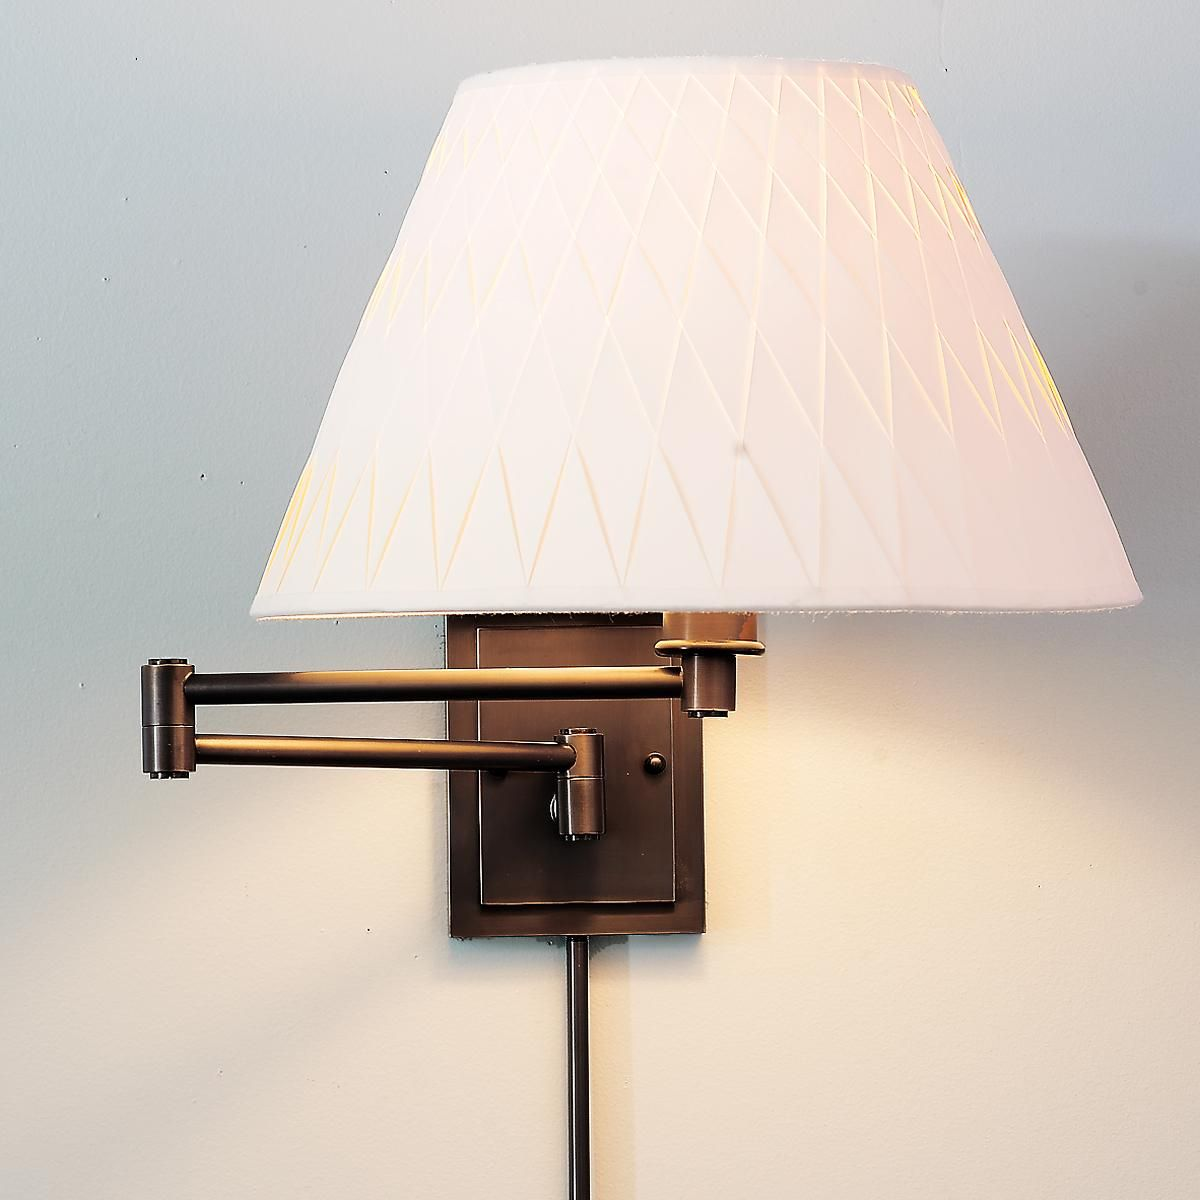 Designer Swing Arm Wall Lamp No Shade Swing Arm Wall Lamps Wall Lamp Small Lamp Shades